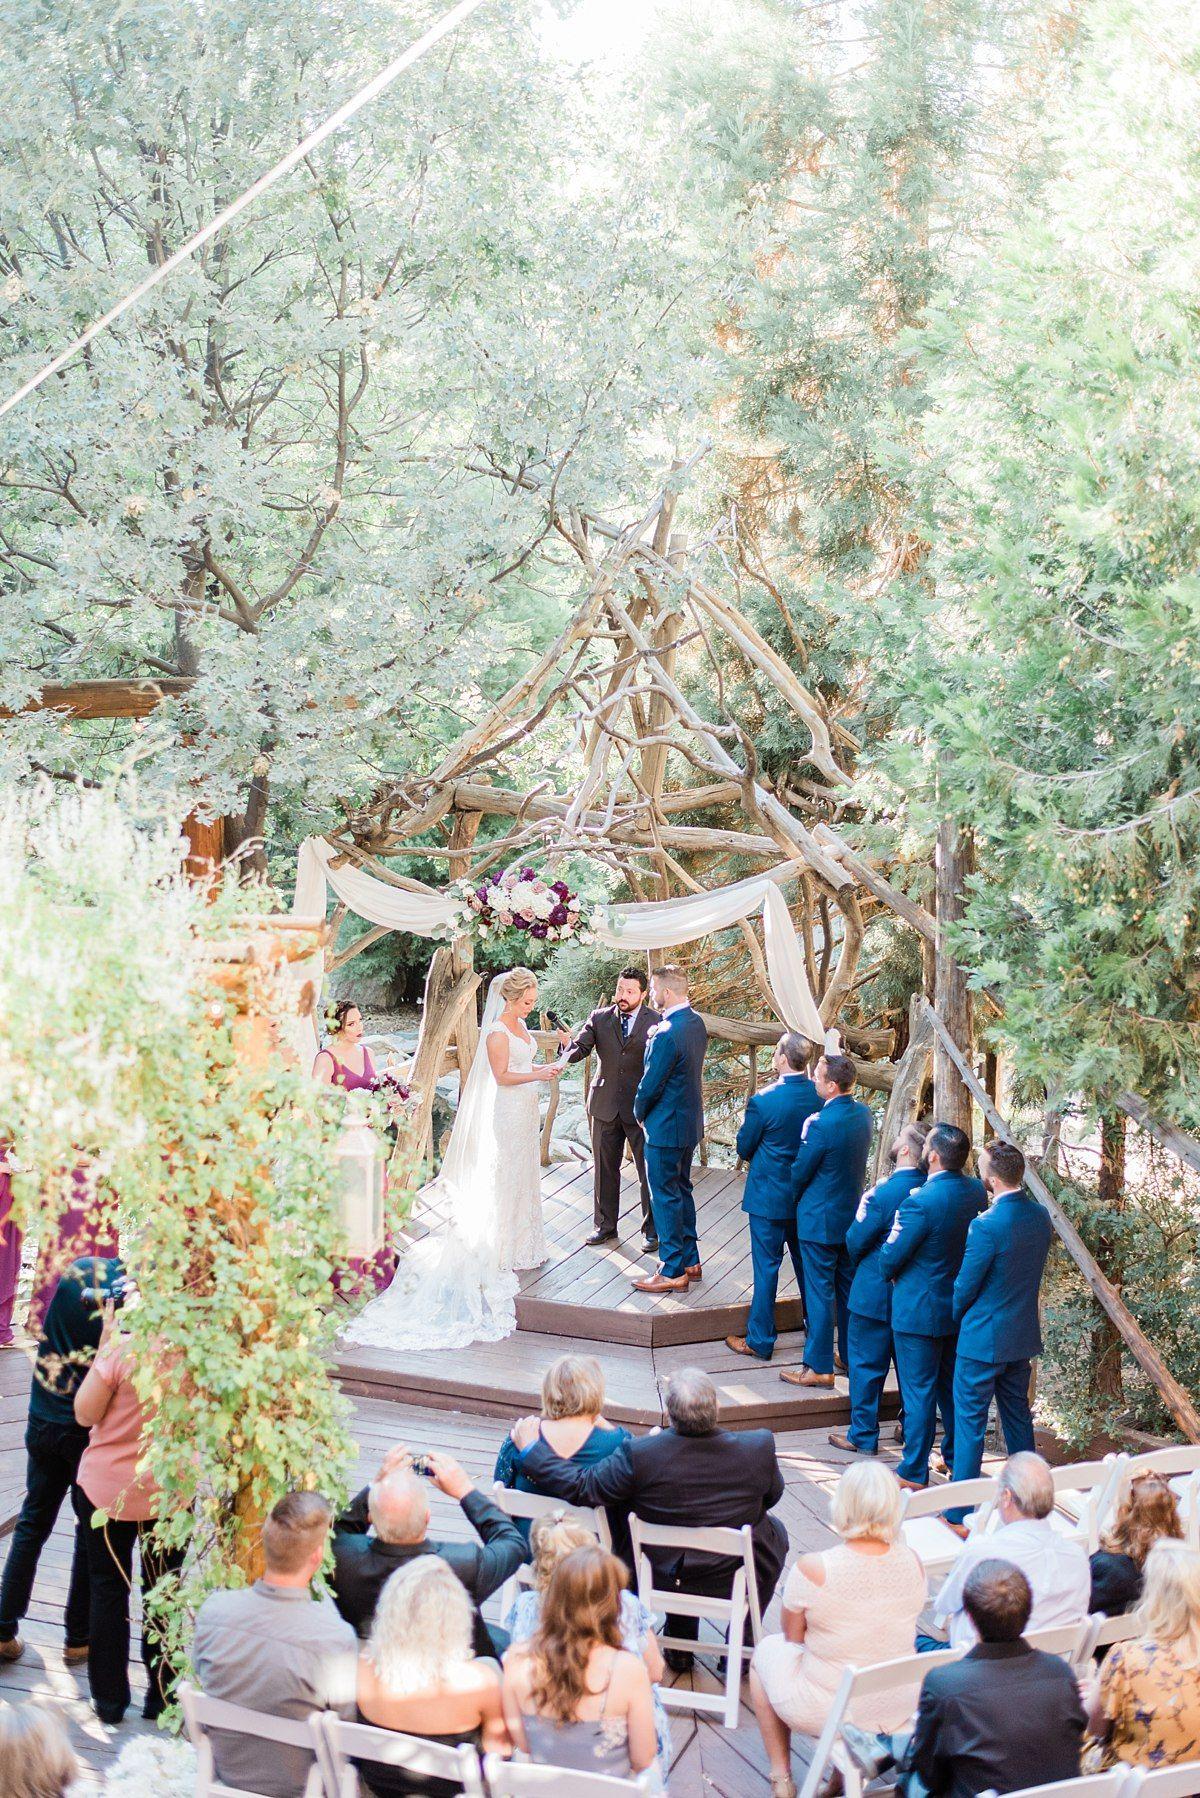 Stunning Wedding Venue Ceremony Location Lake Arrowhead Modern Wedding Ceremony Rose Wedding Decorations Elegant Modern Wedding